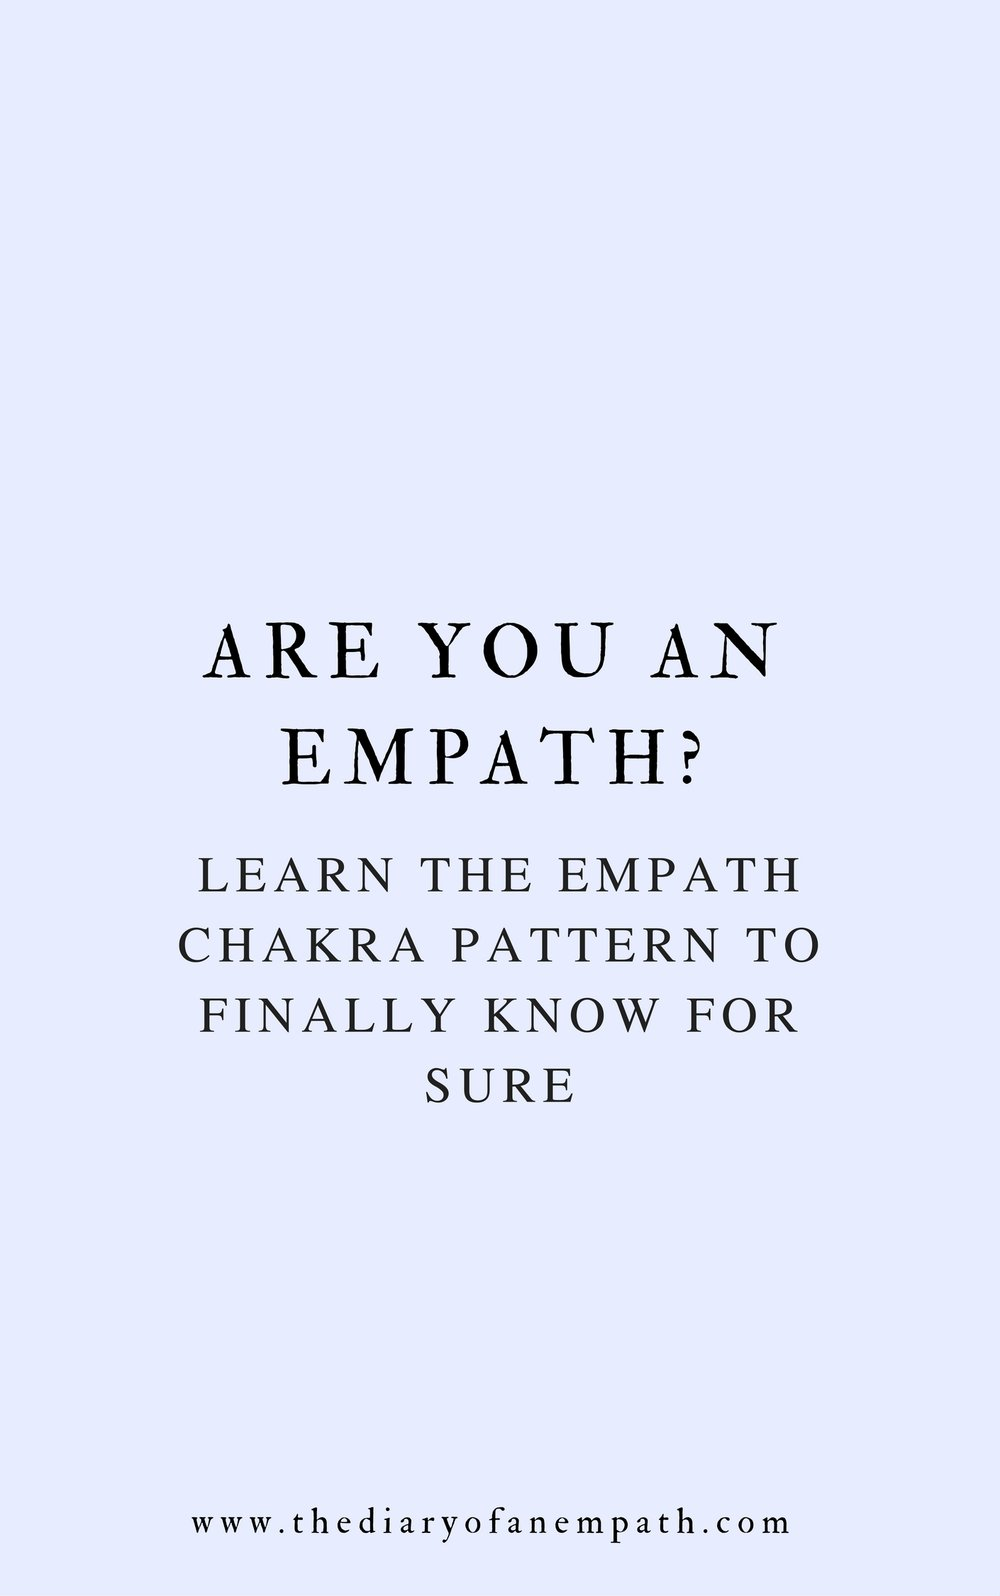 the empath chakra pattern, thediaryofanempath.com